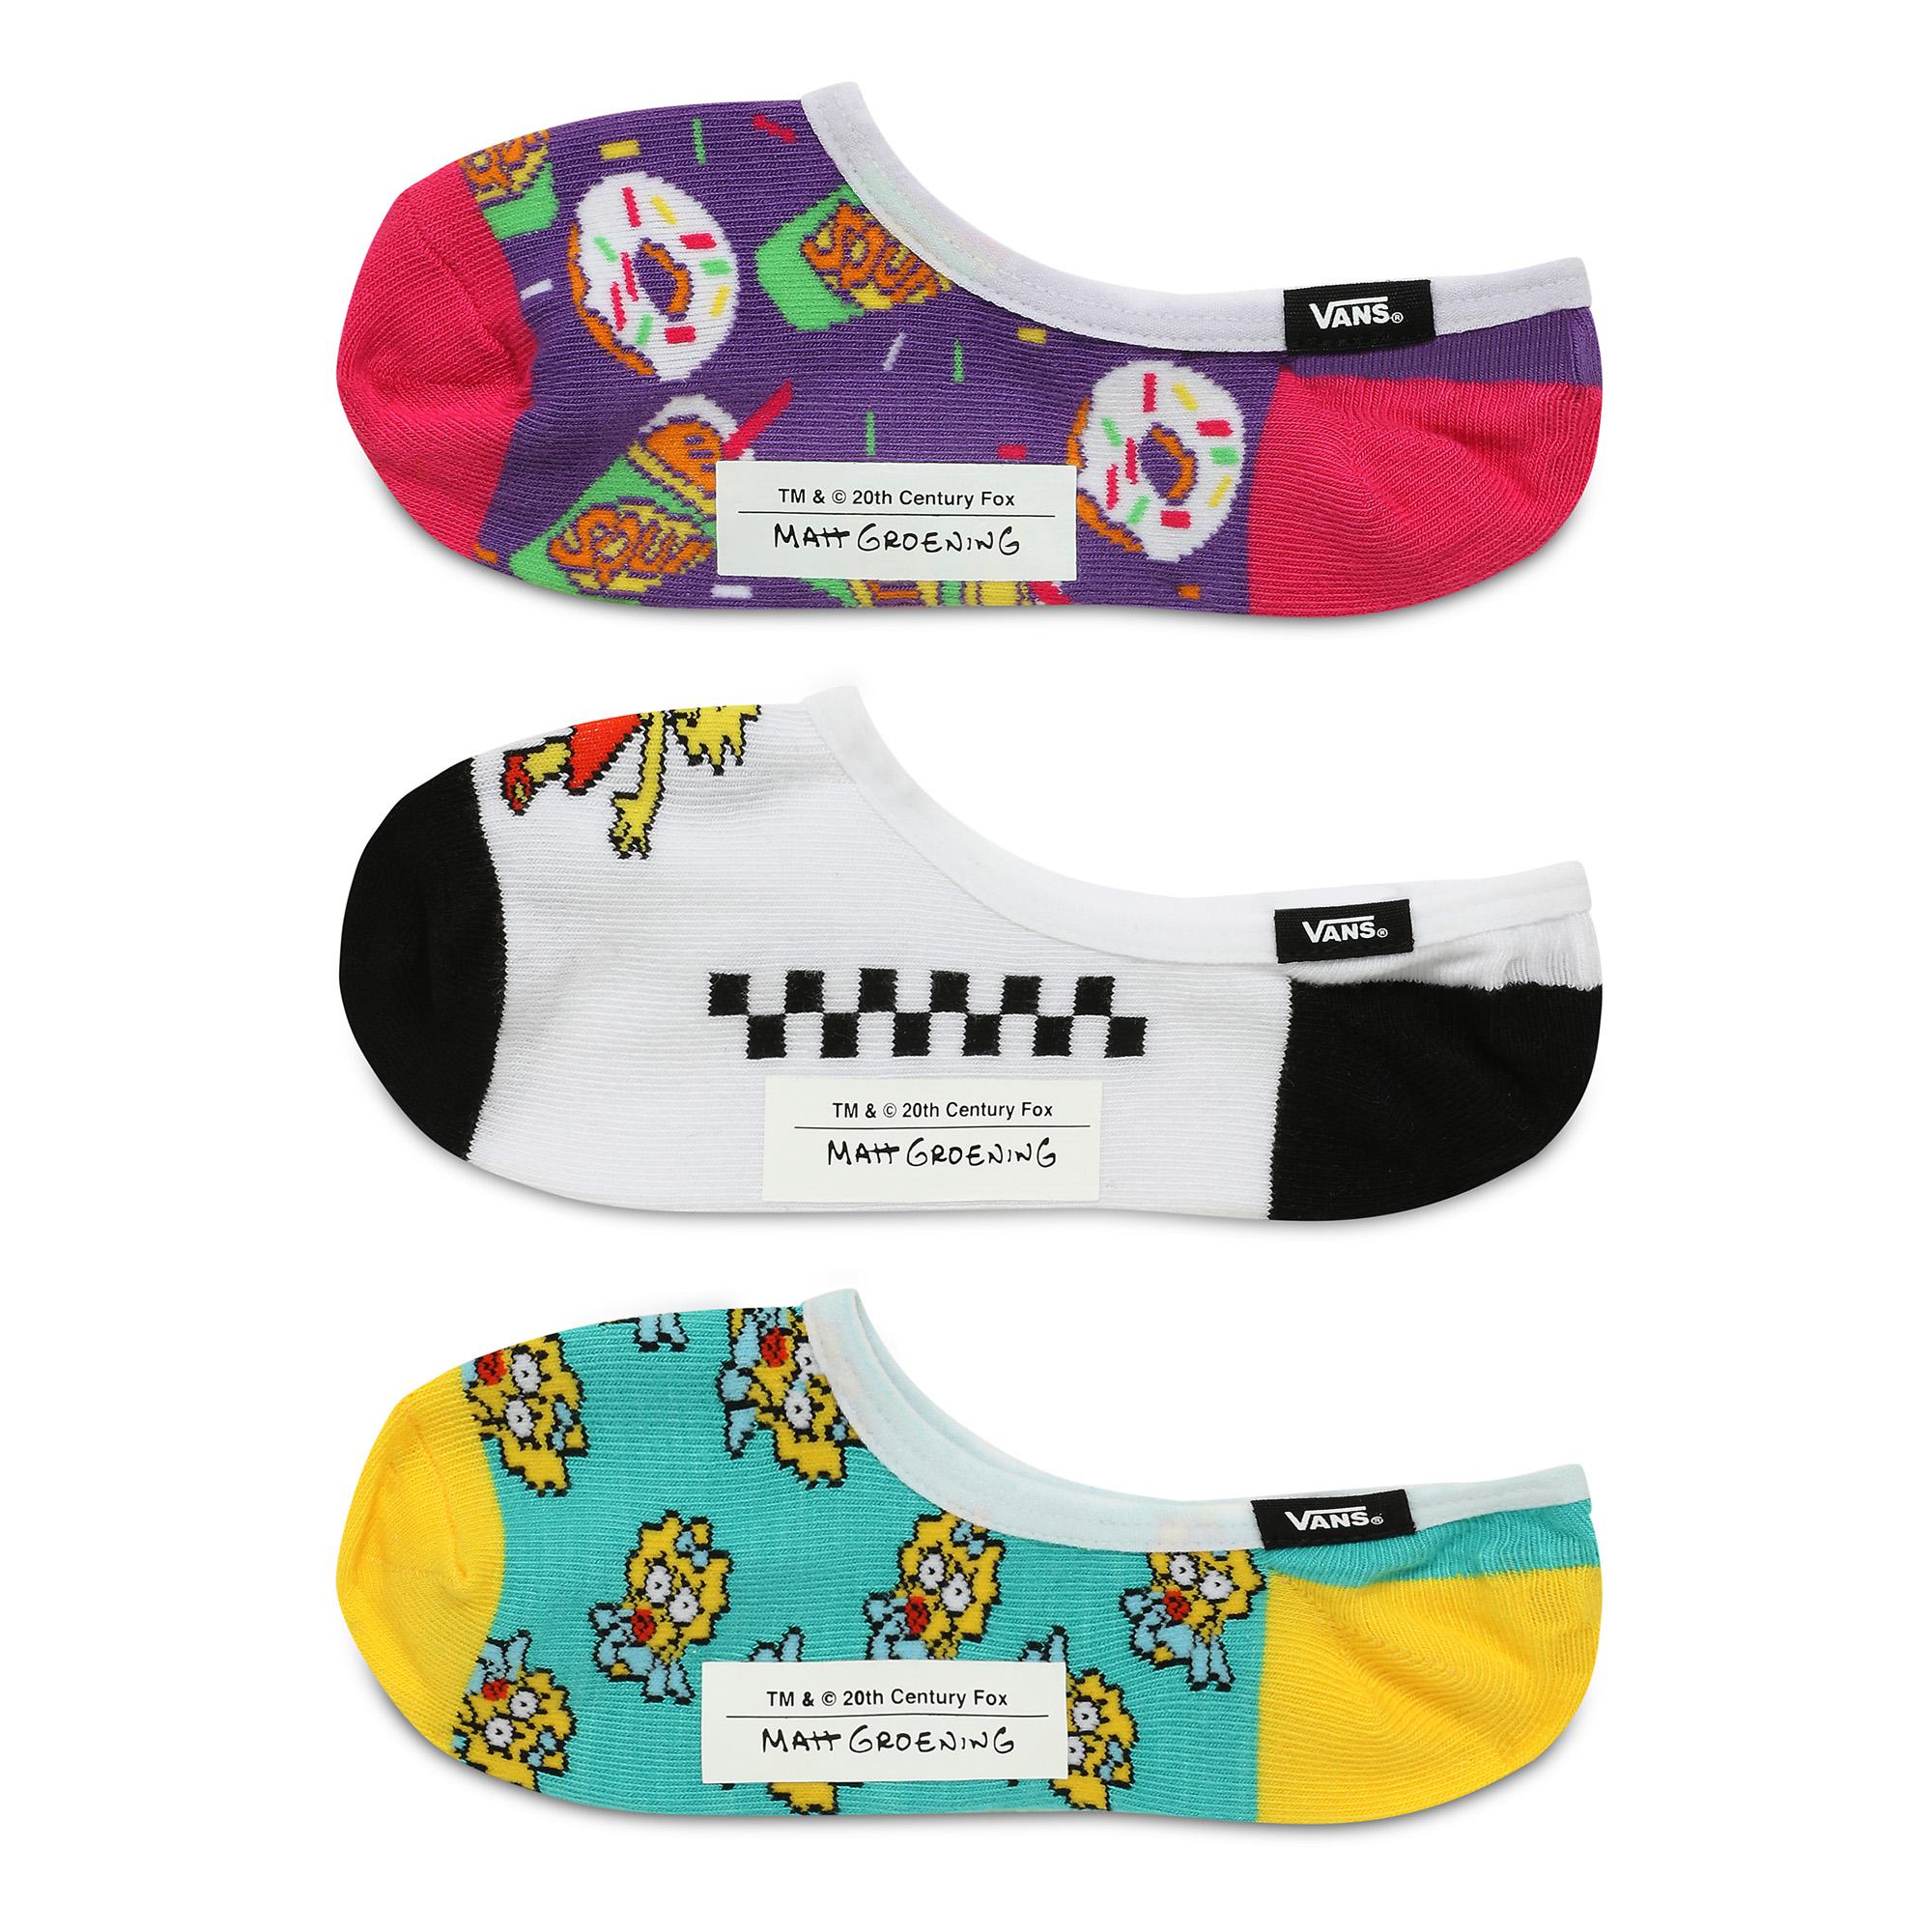 Носки Vans X The Simpsons Family Canoodles (3 шт.)